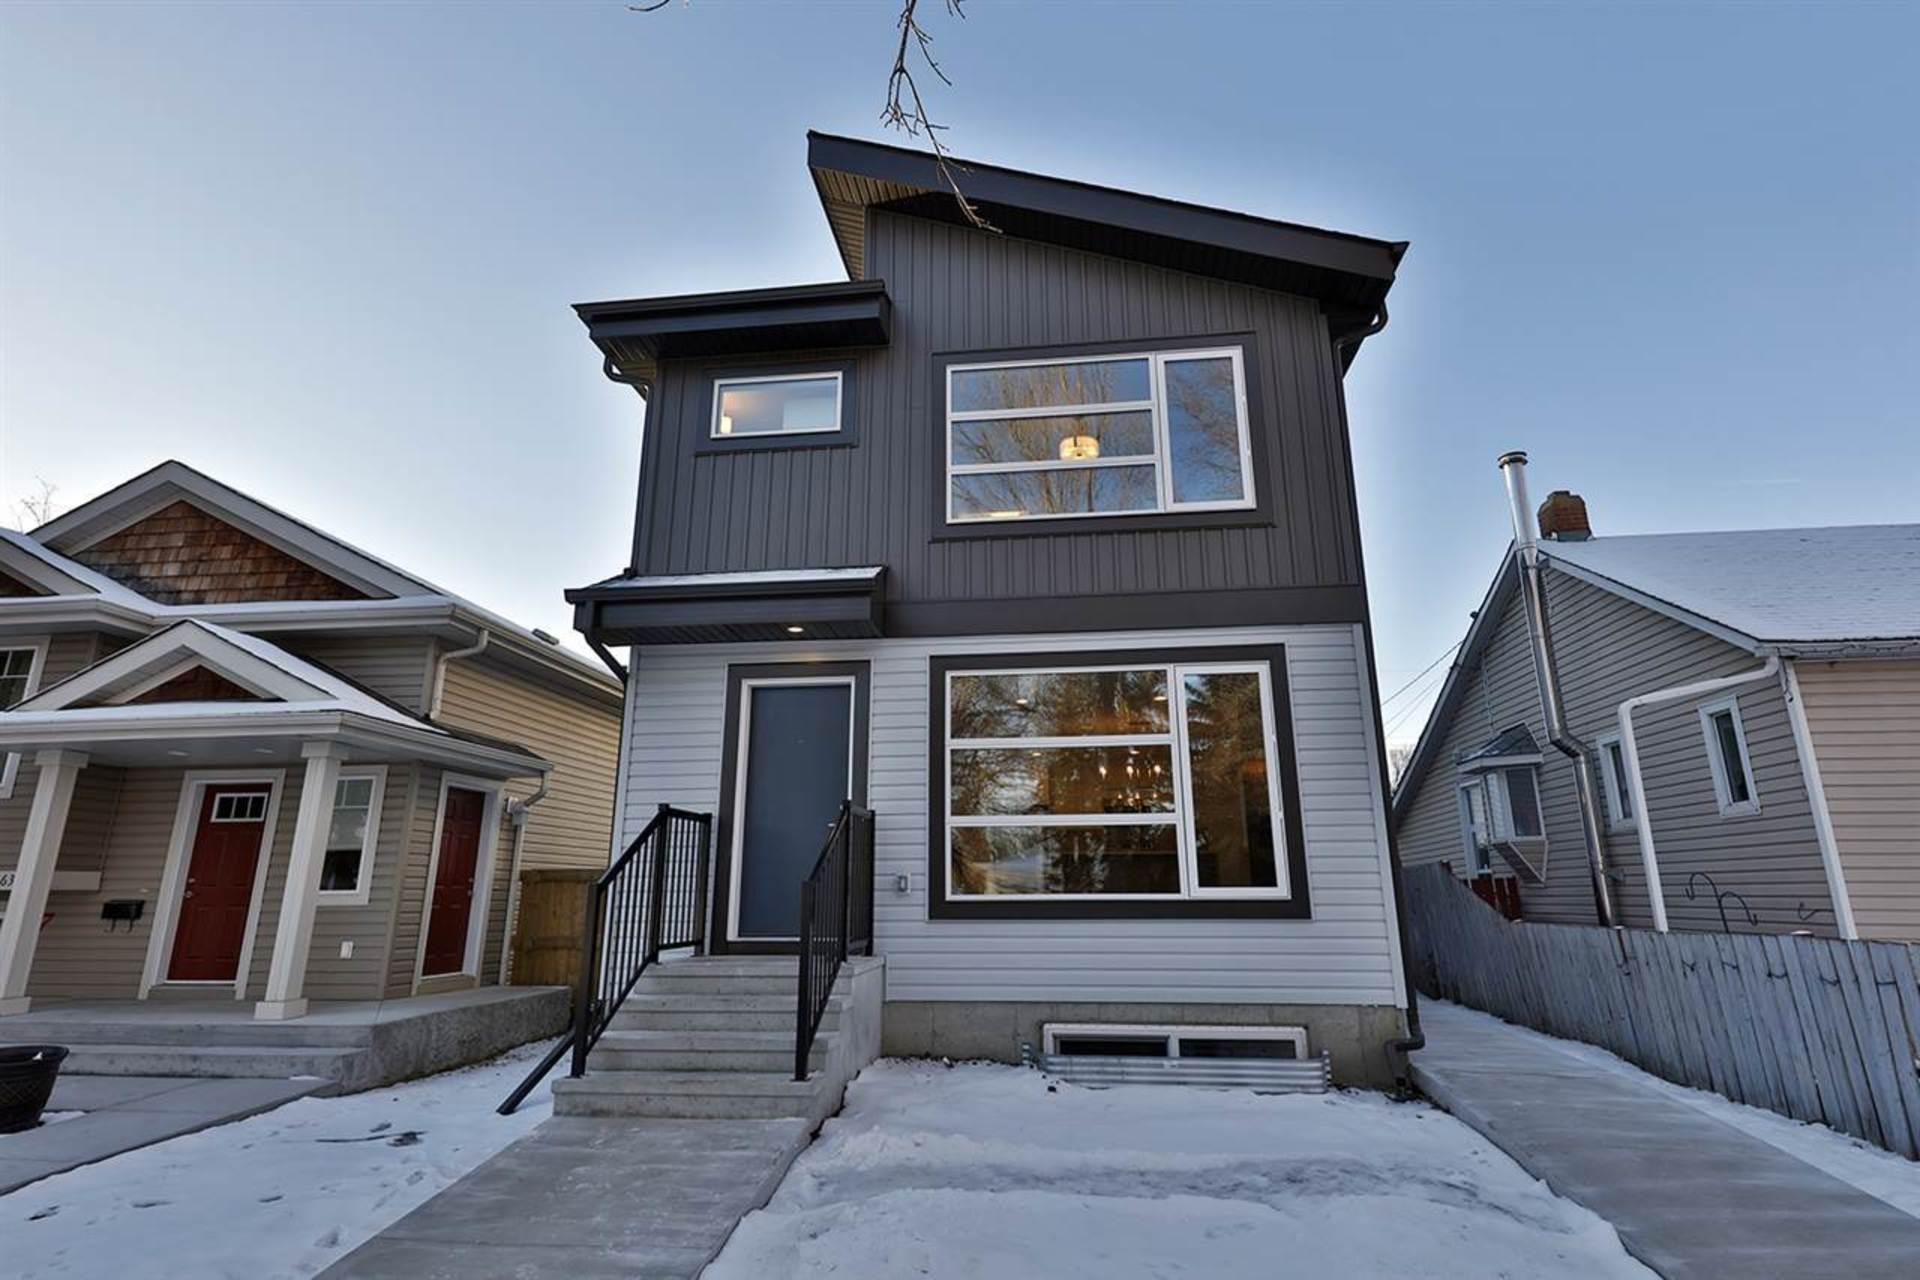 11636-84-street-parkdale_edmo-edmonton-01 at 11636 84 Street, Parkdale_EDMO, Edmonton